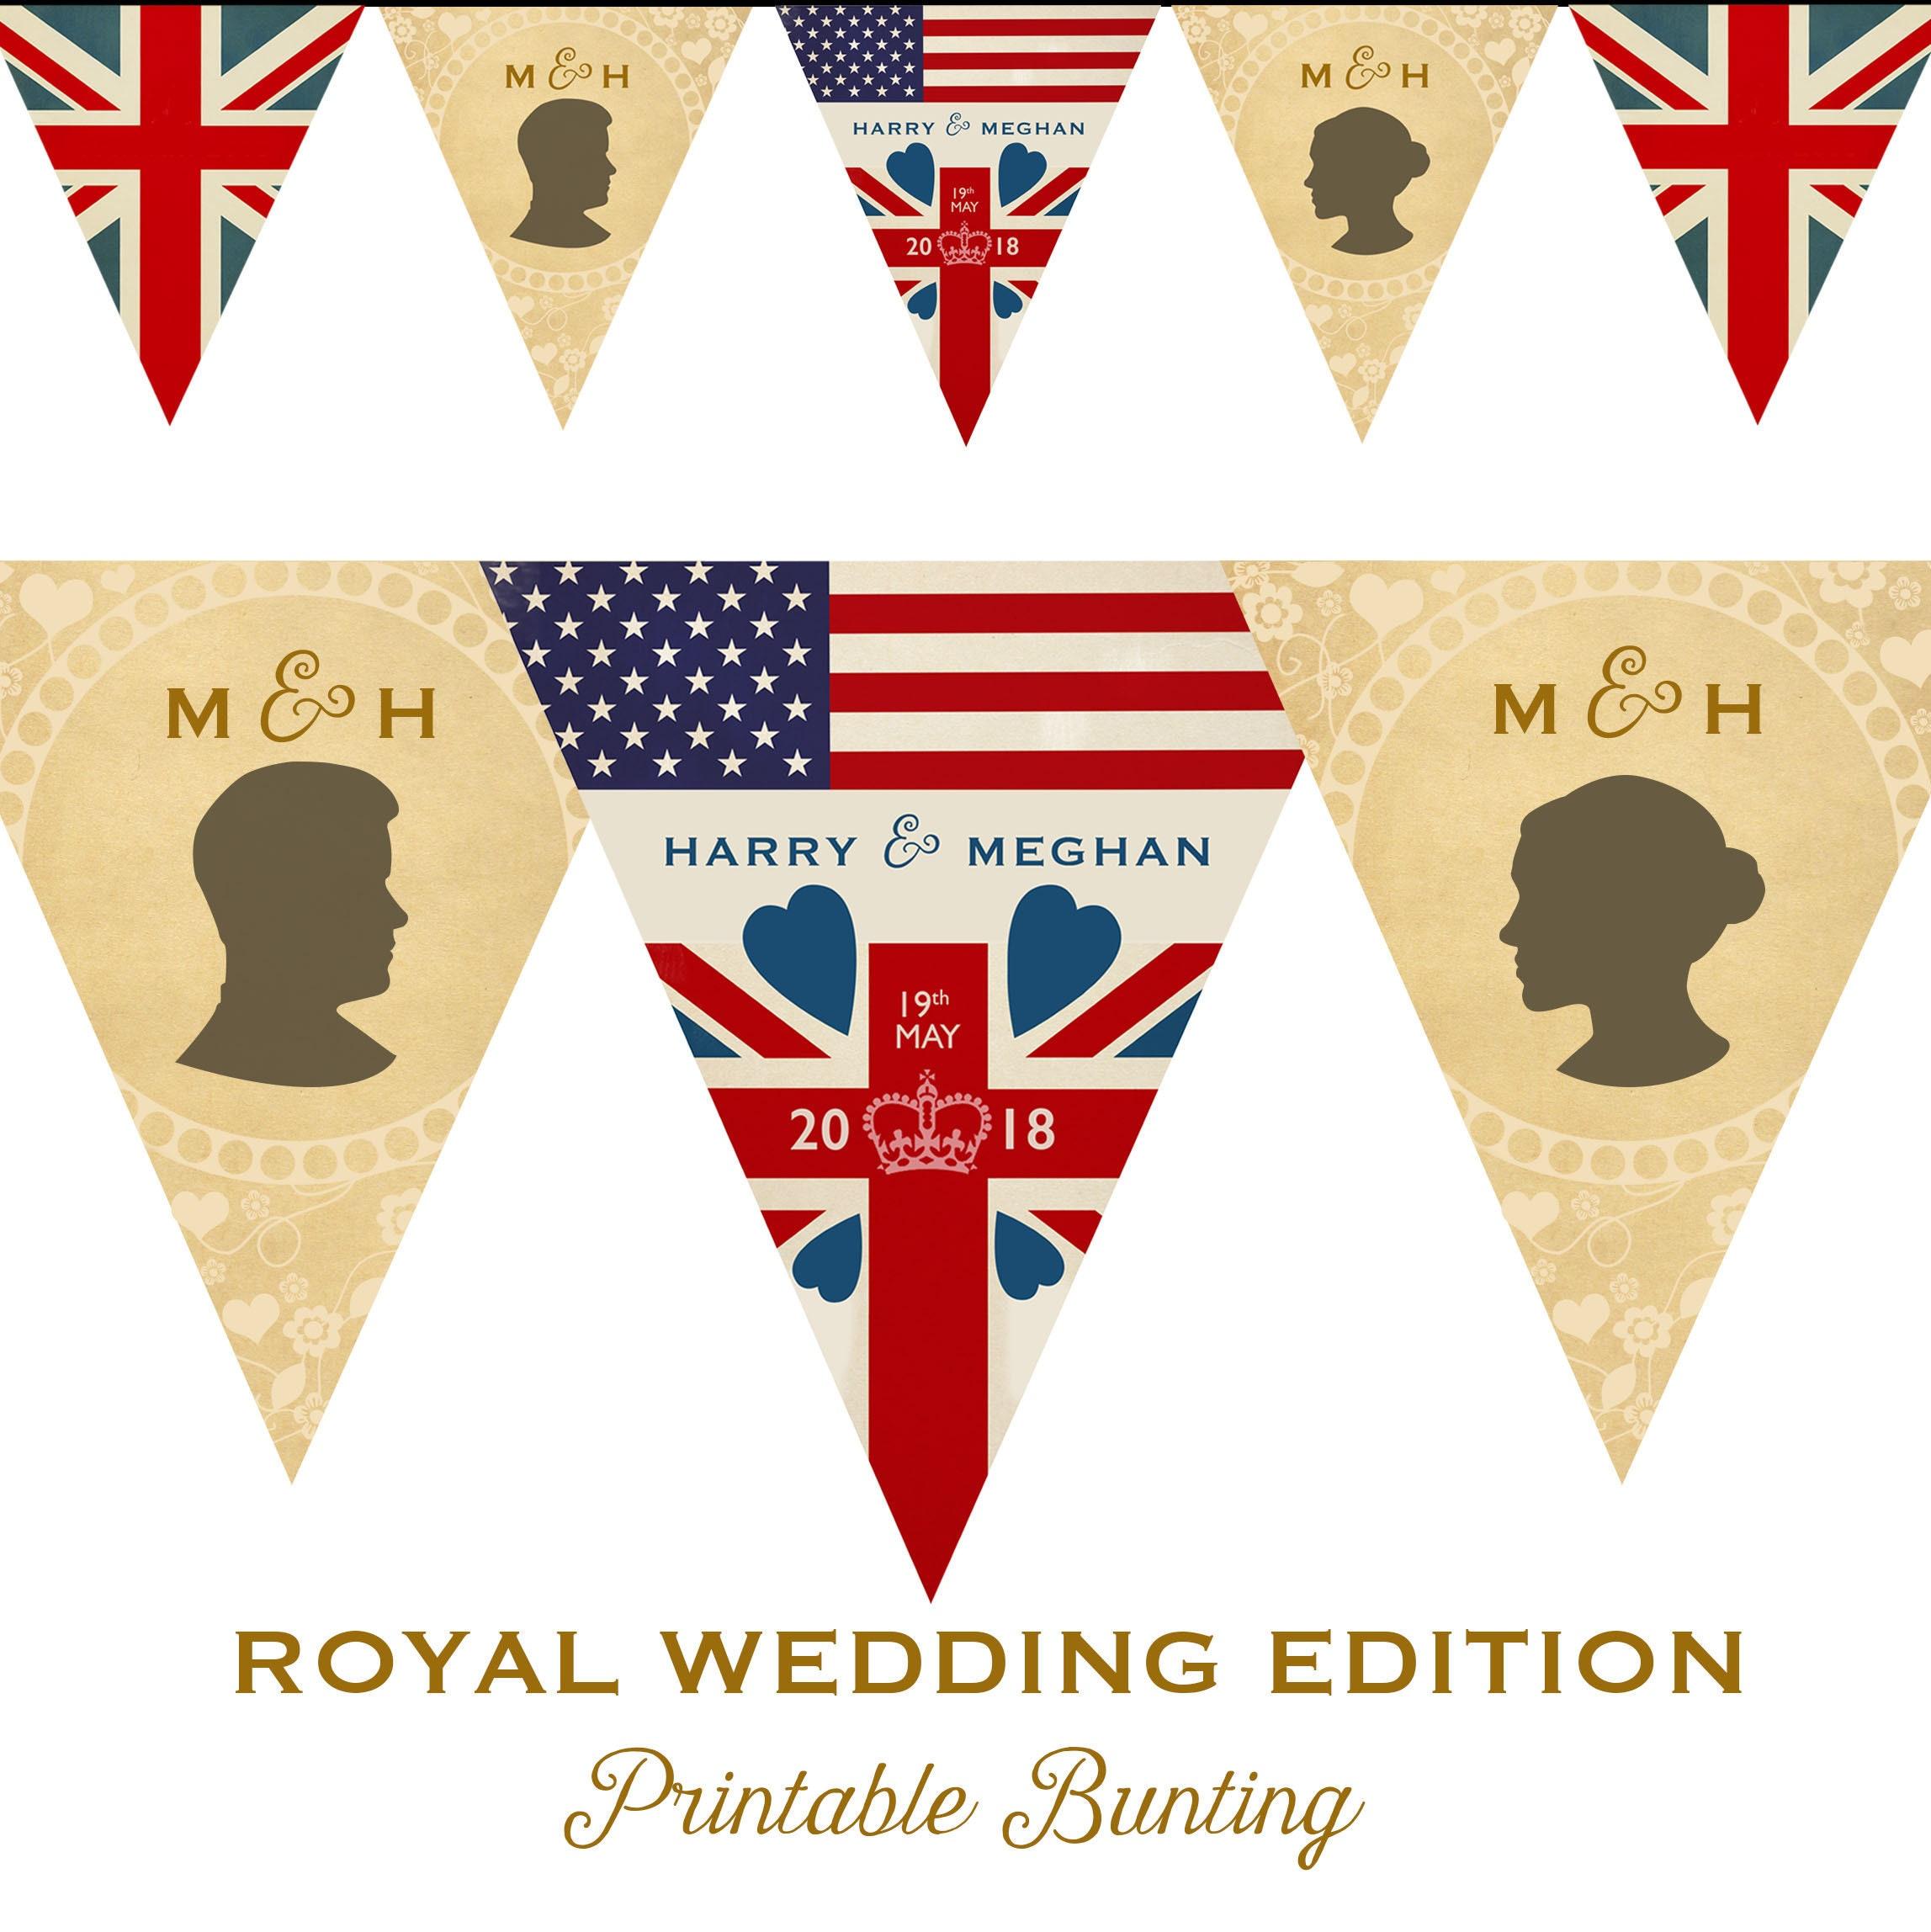 Royal Wedding Printable Party Bunting British Street Party